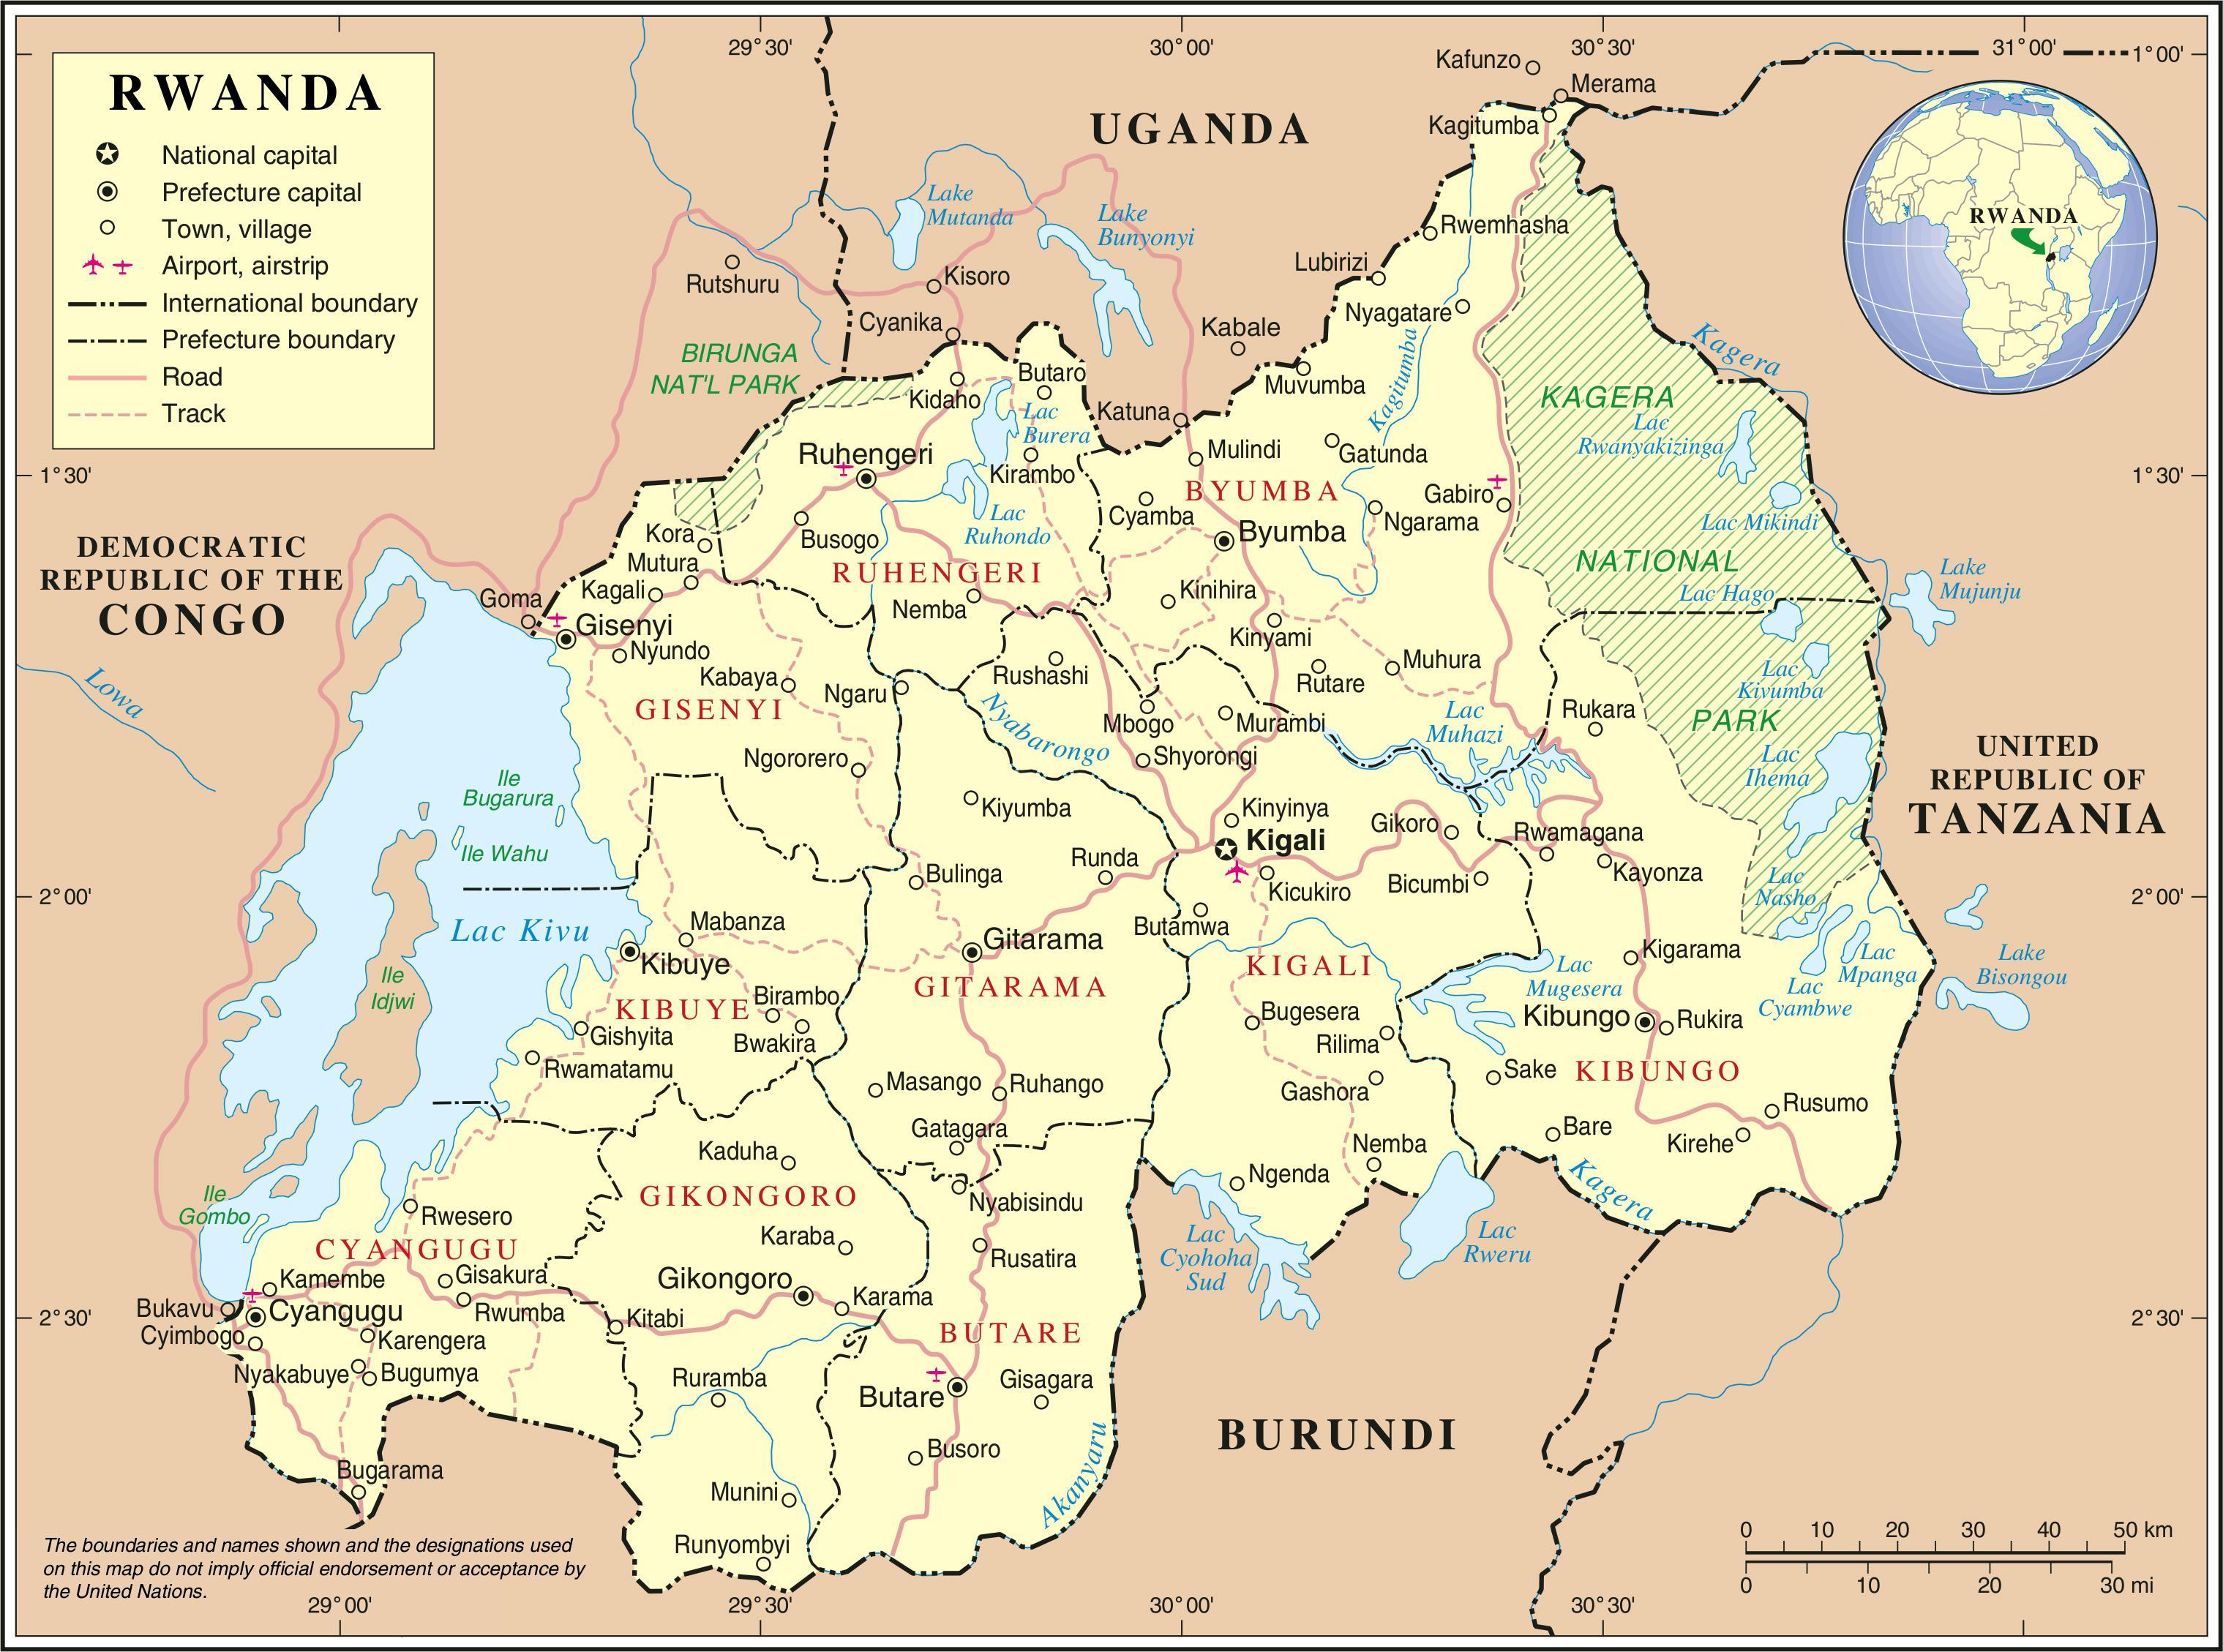 Hallinto Kartta Ruanda Kartta Hallinnollinen Kartta Ruanda Ita